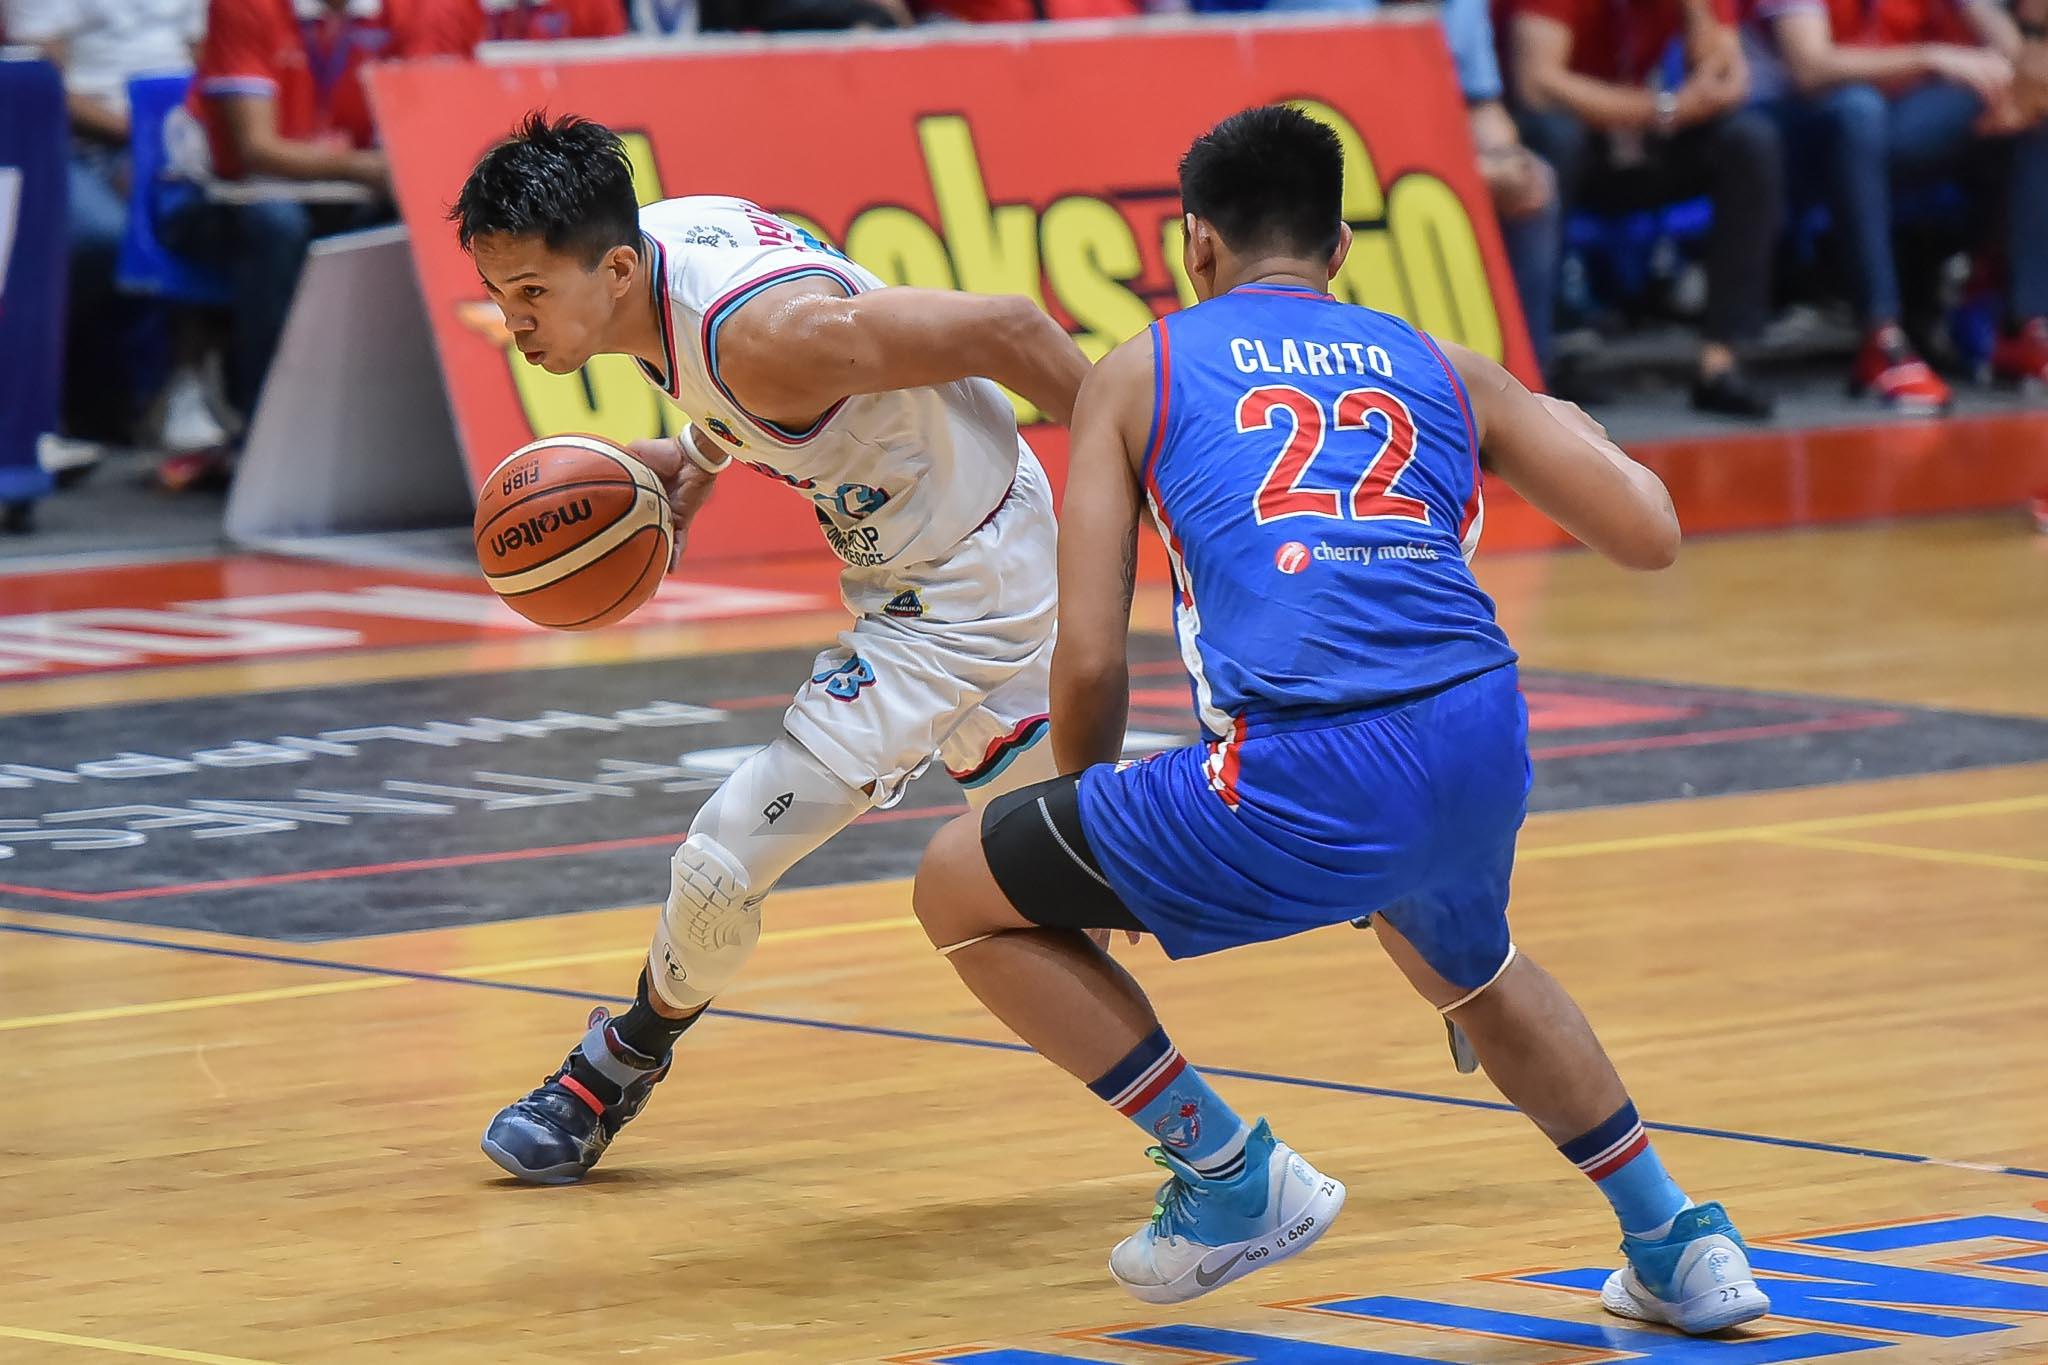 MPBL-2020-San-Juan-vs.-Pasay-Reverente-6117 Roider Cabrera to lead Terrafirma in PBA 3x3 3x3 Basketball News PBA 3X3  - philippine sports news